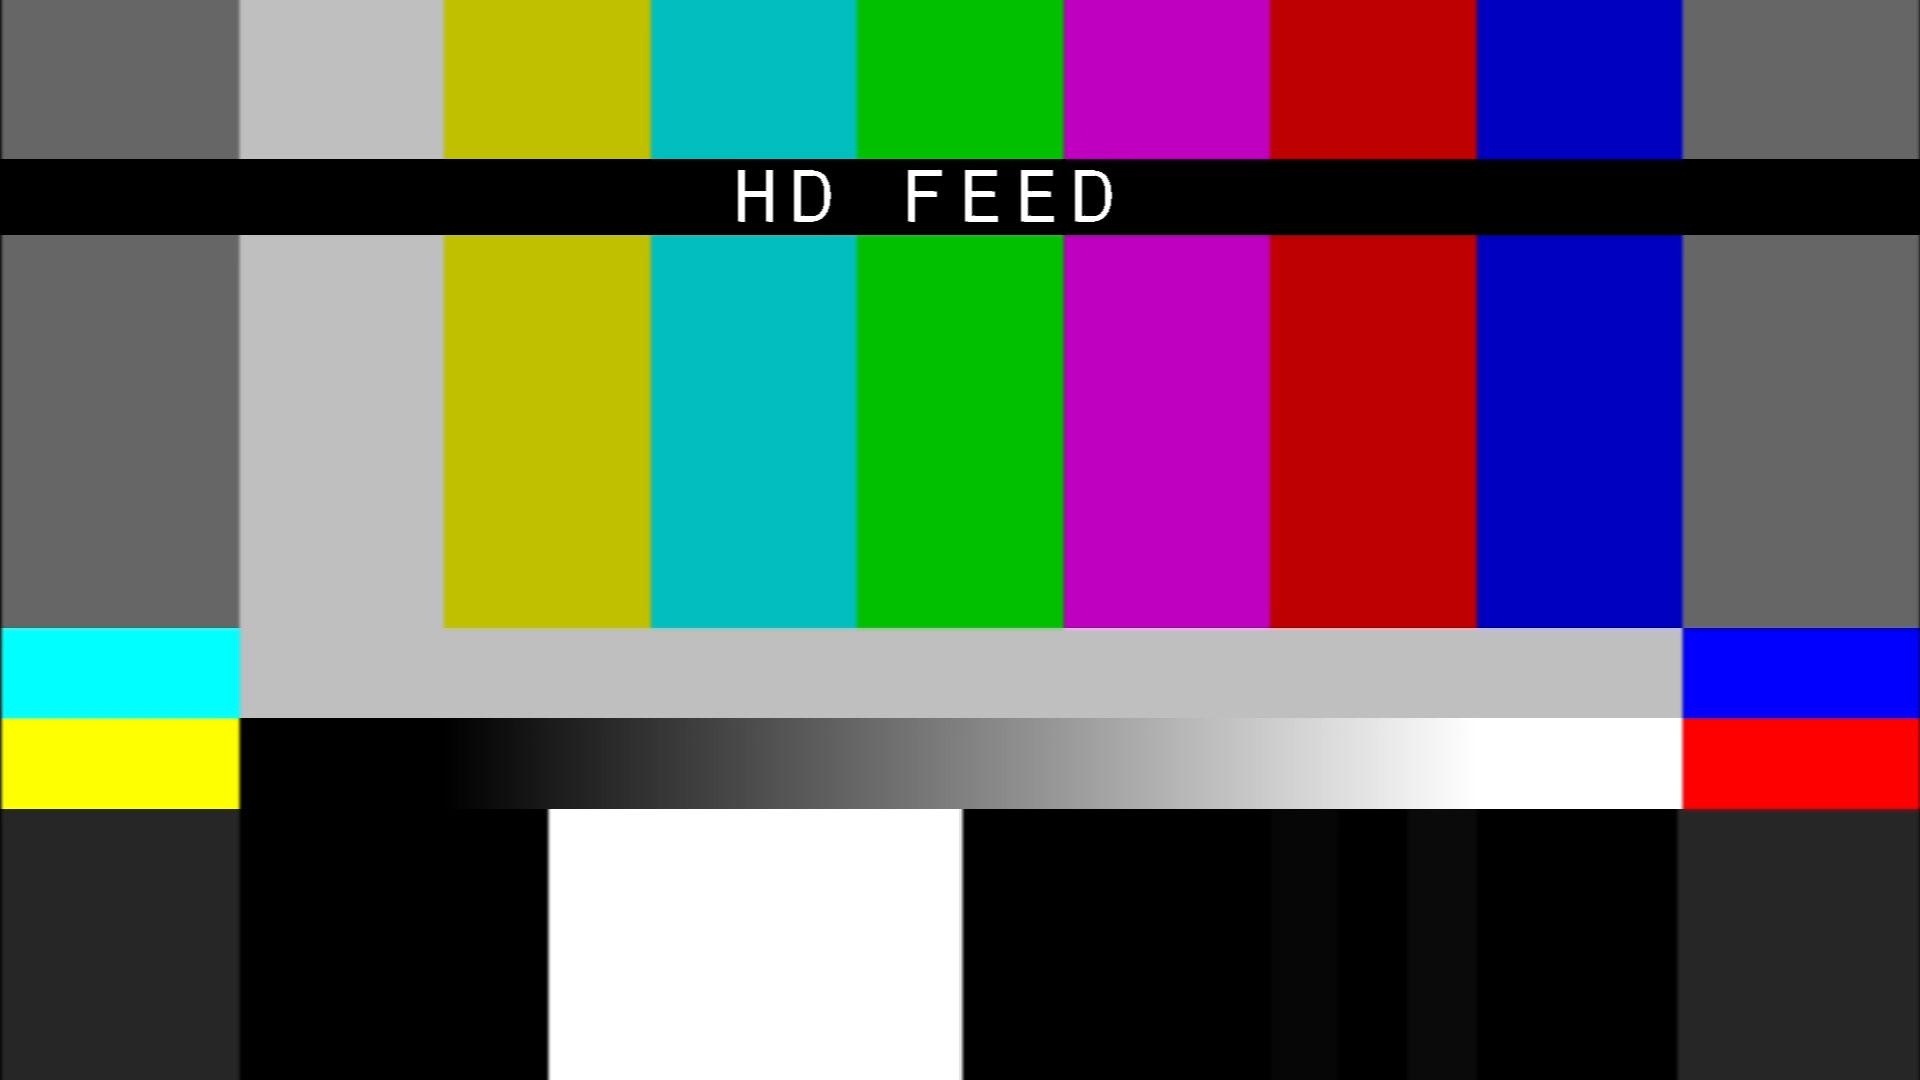 Frekuensi siaran Videovision di satelit AsiaSat 5 Terbaru